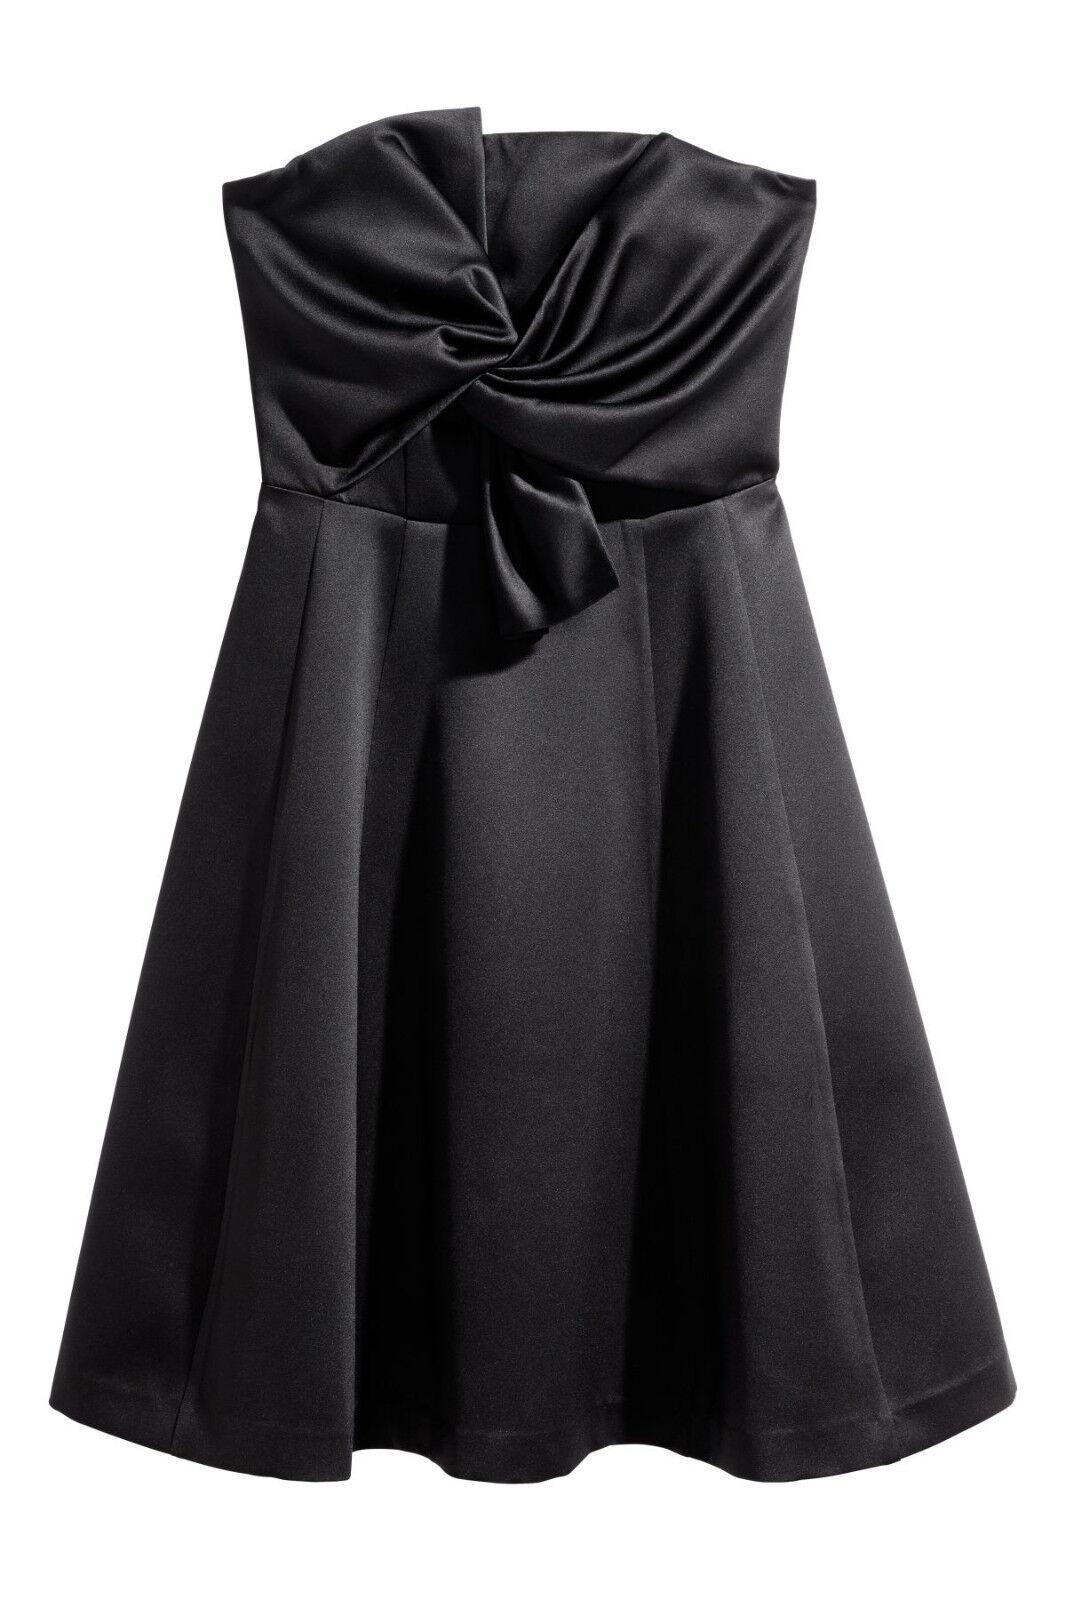 NEU H&M Kurzes Bandeau-Kleid Gr.36 oder 46 dunkelblau Party Abend-Kleid zu Jacke